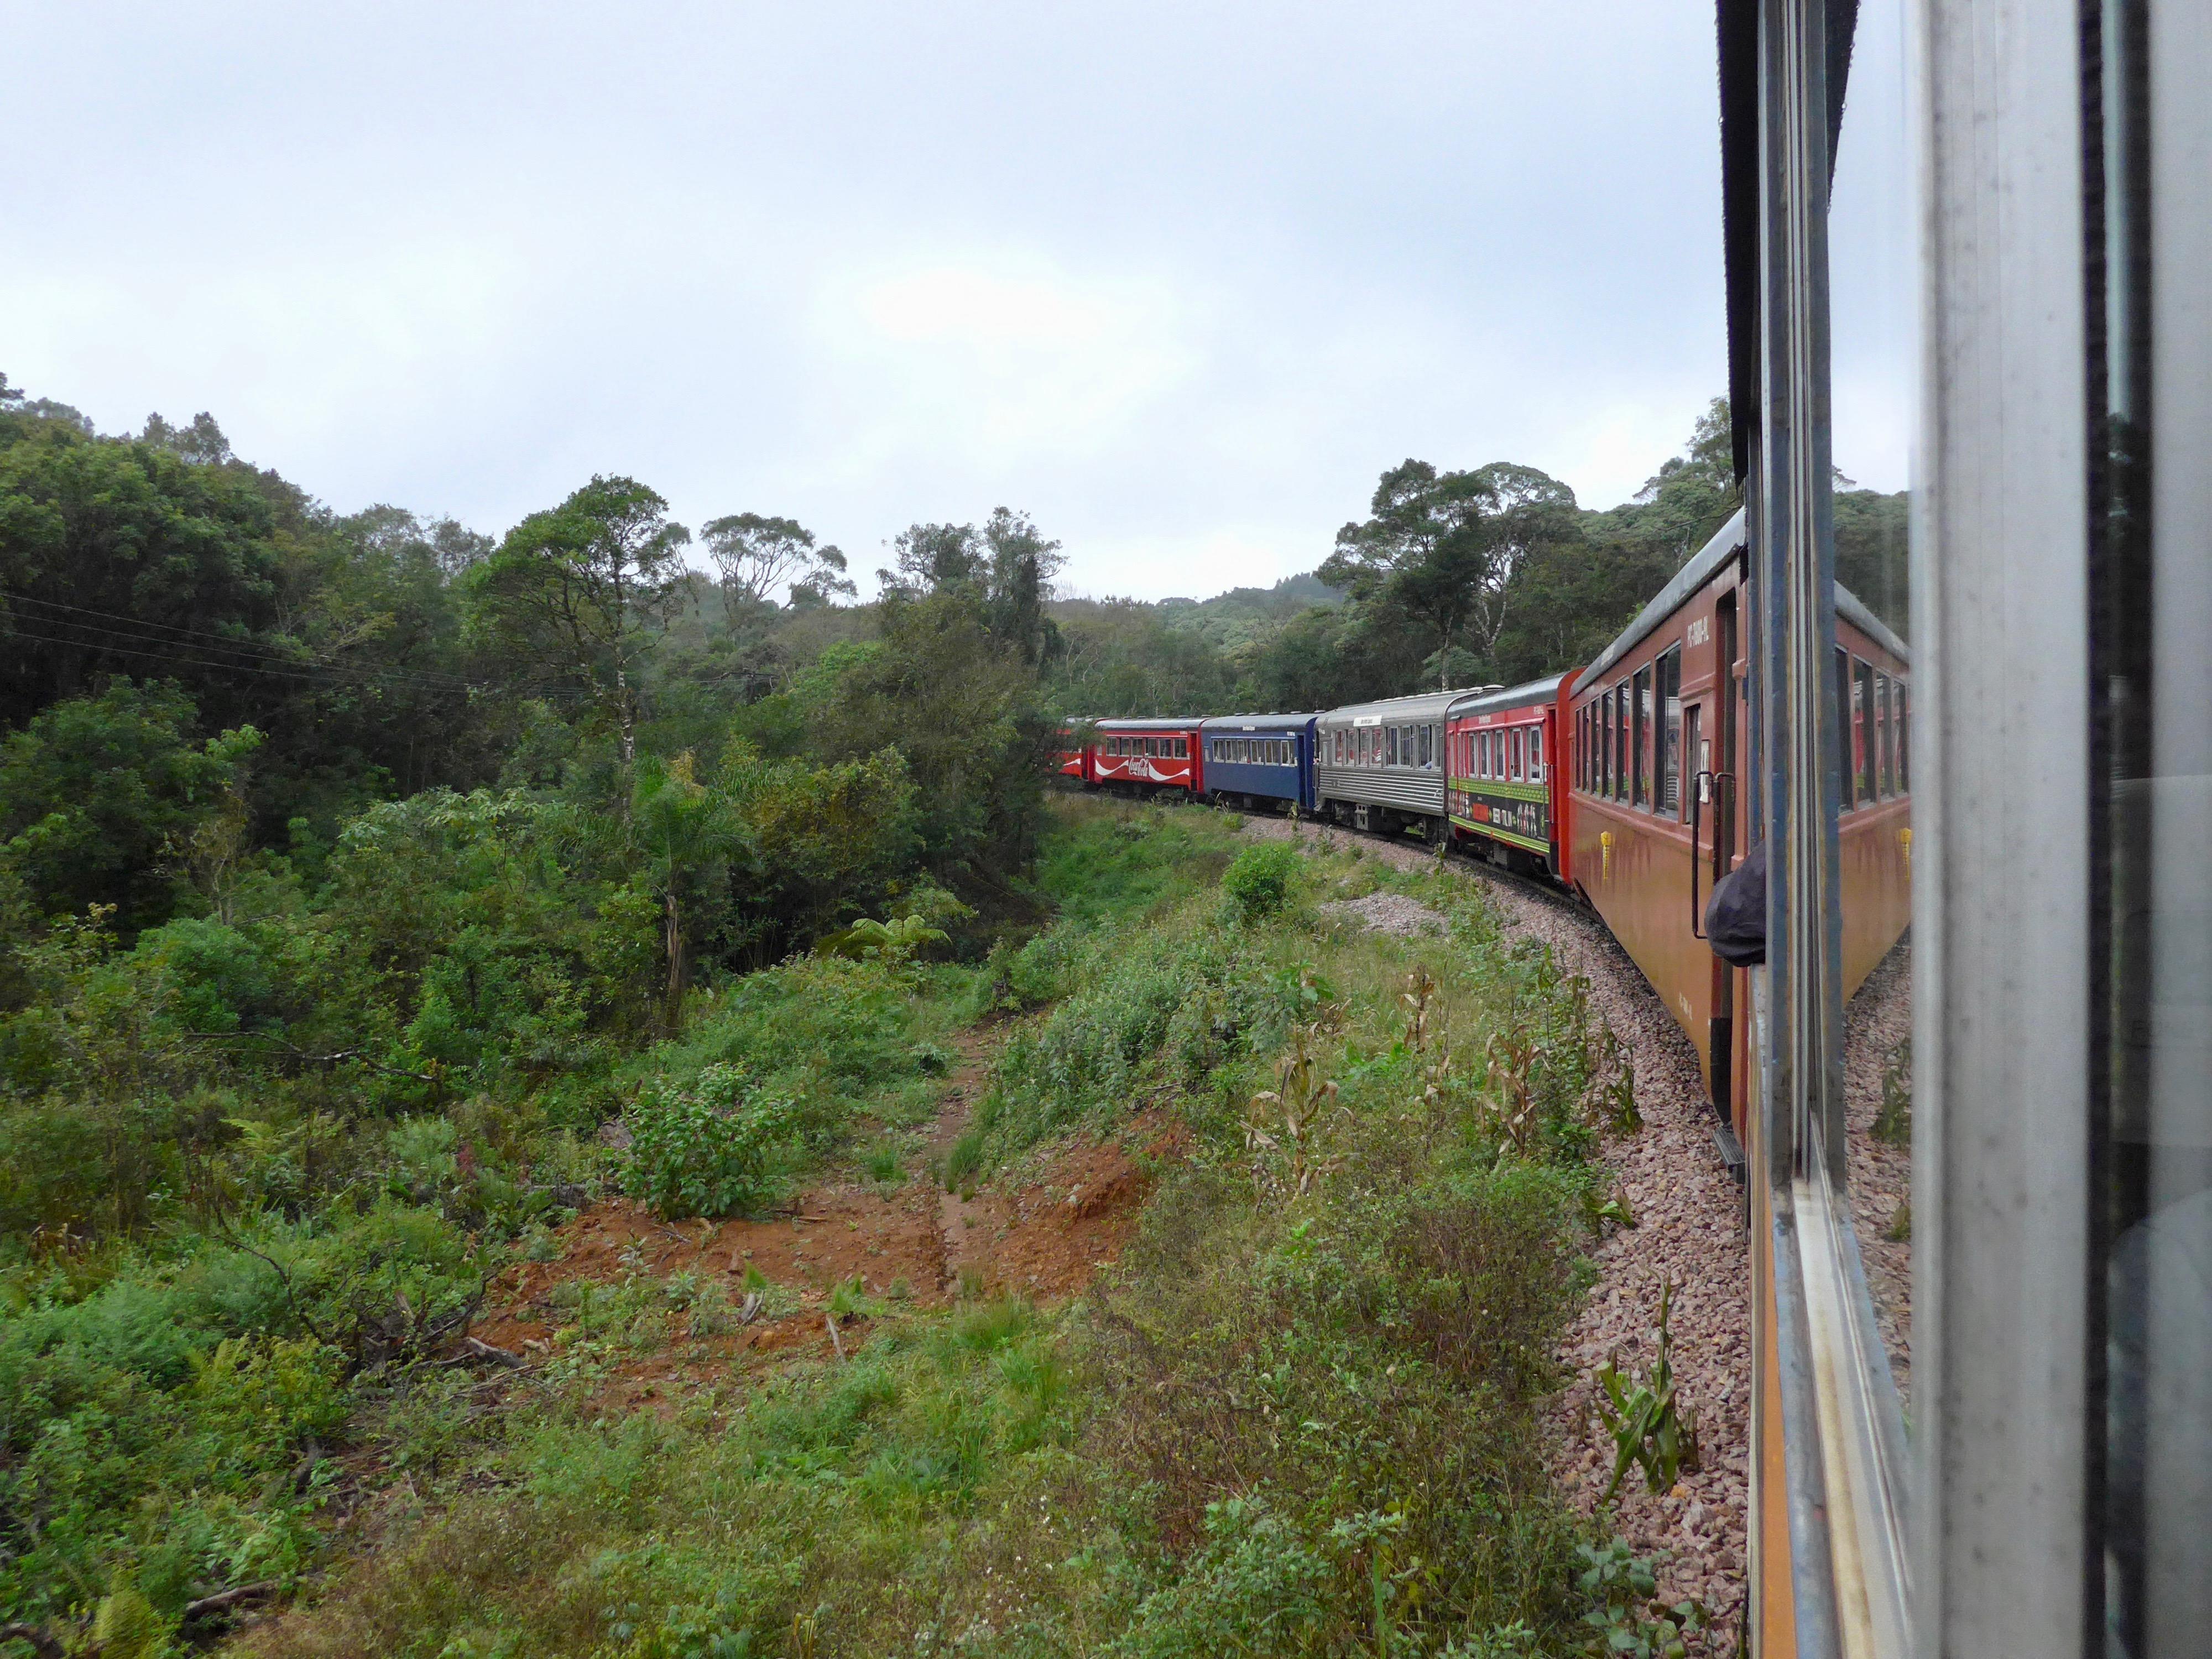 A Estrada de Ferro Curitiba-Paranaguá